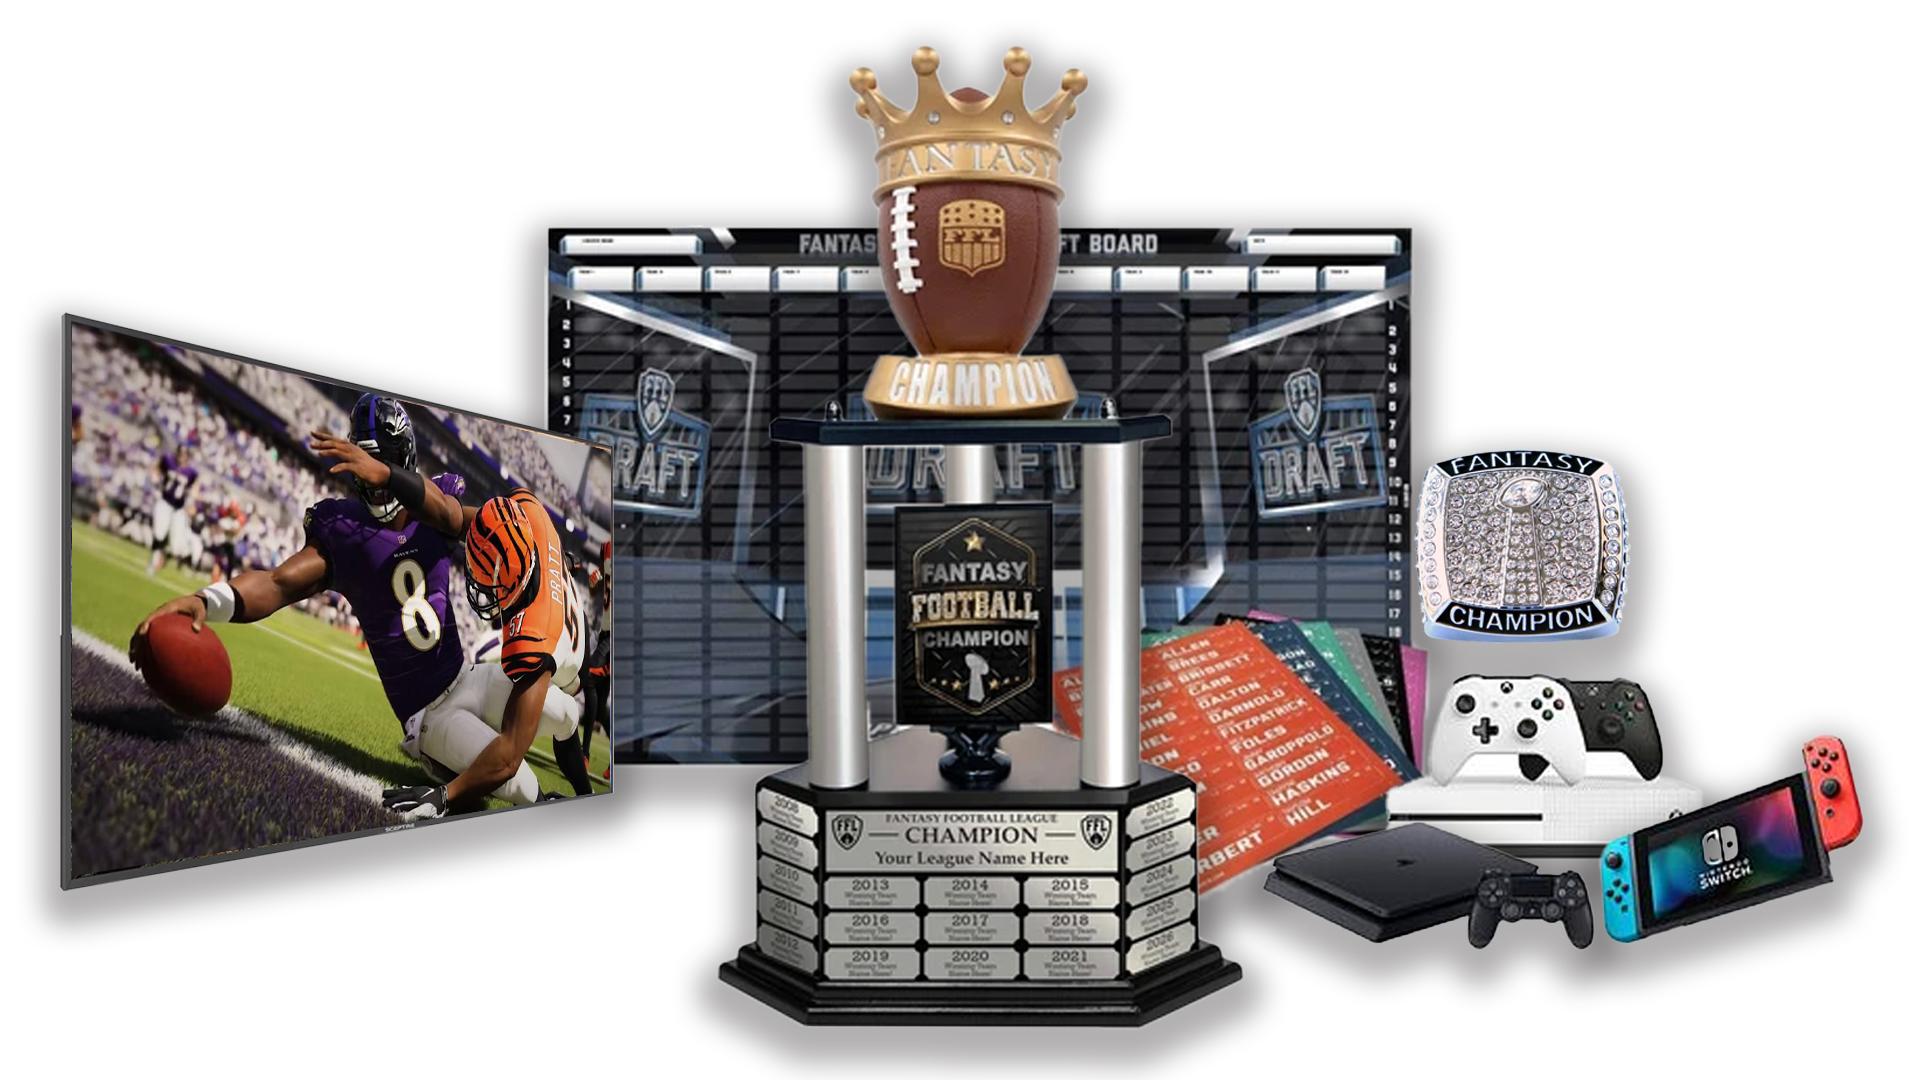 - FFDraft Trophy 2 - Fantasy Football Draft Parties at 1Life2Play